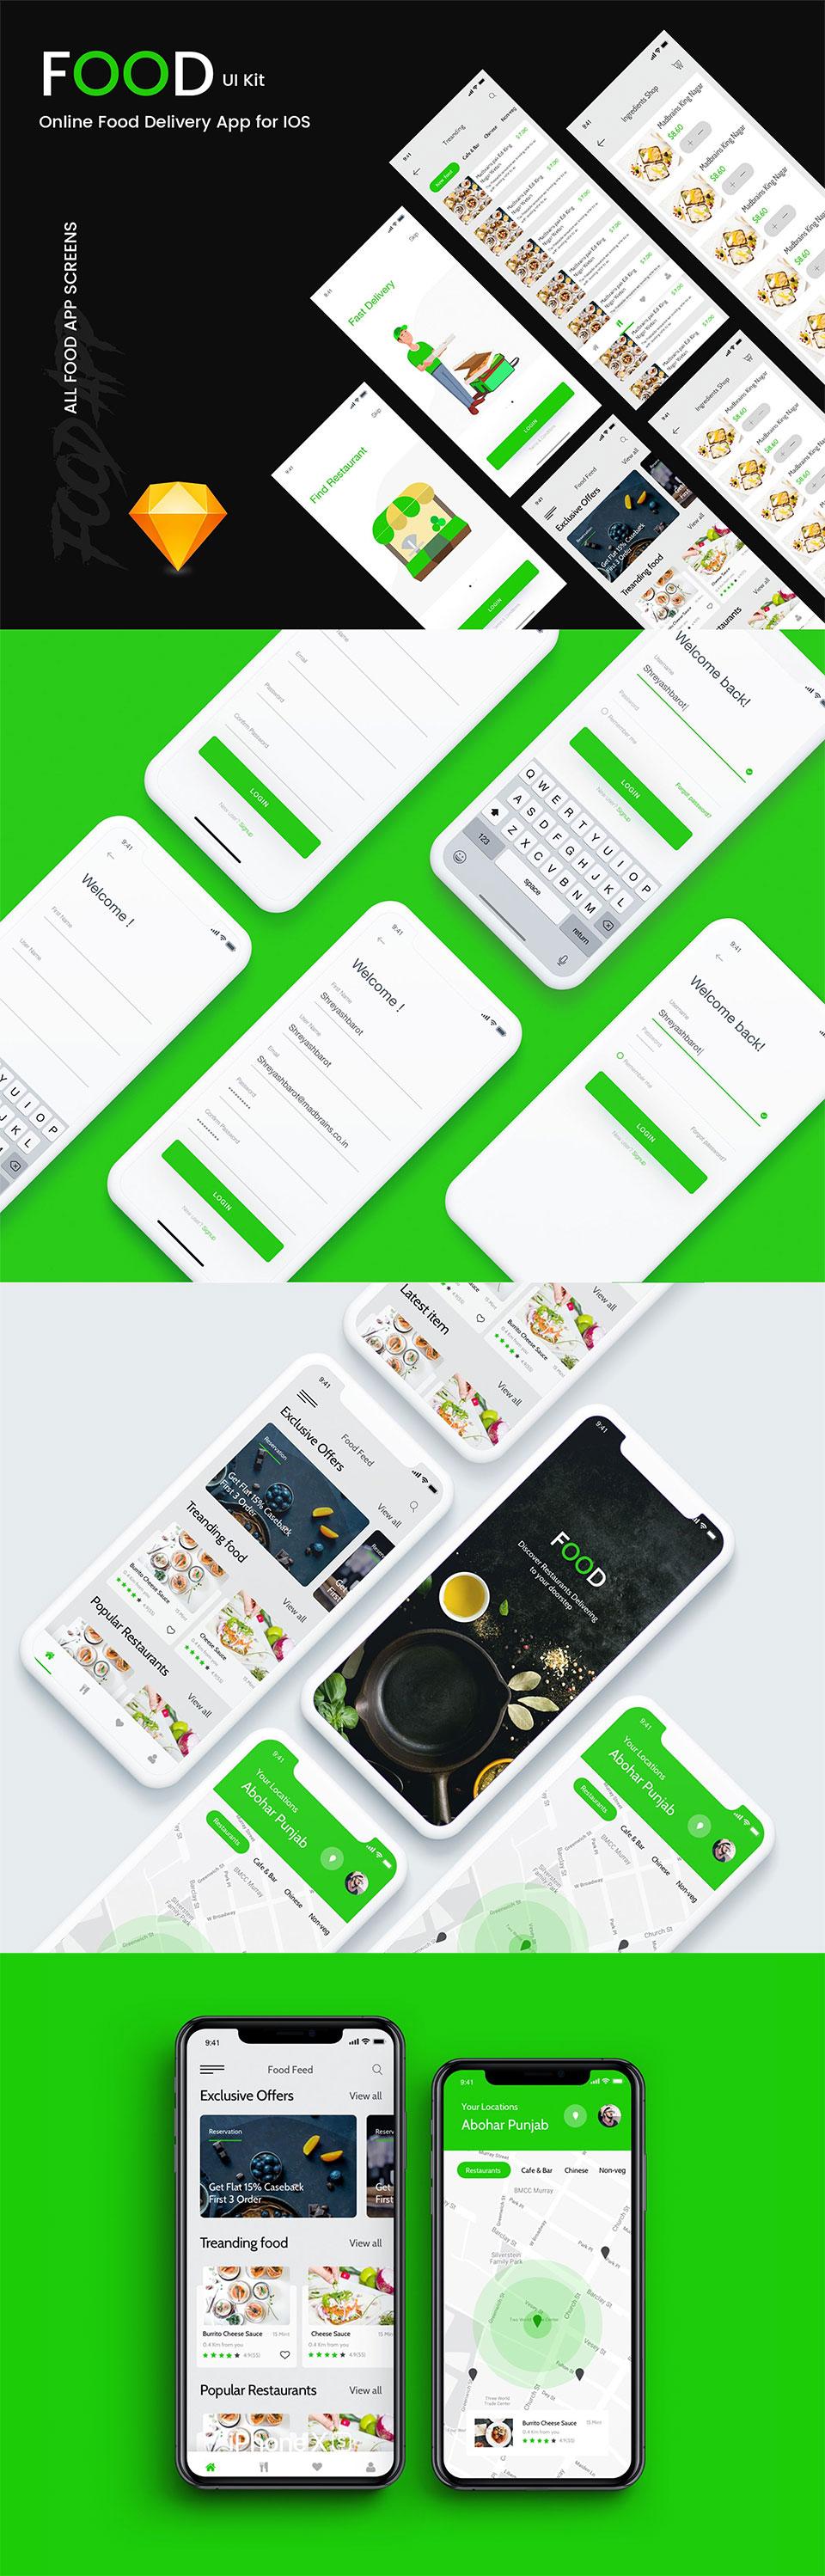 清新简洁的美食外卖派送 APP UI KIT 模板套装下载 [Sketch] Food UI Kit Directory